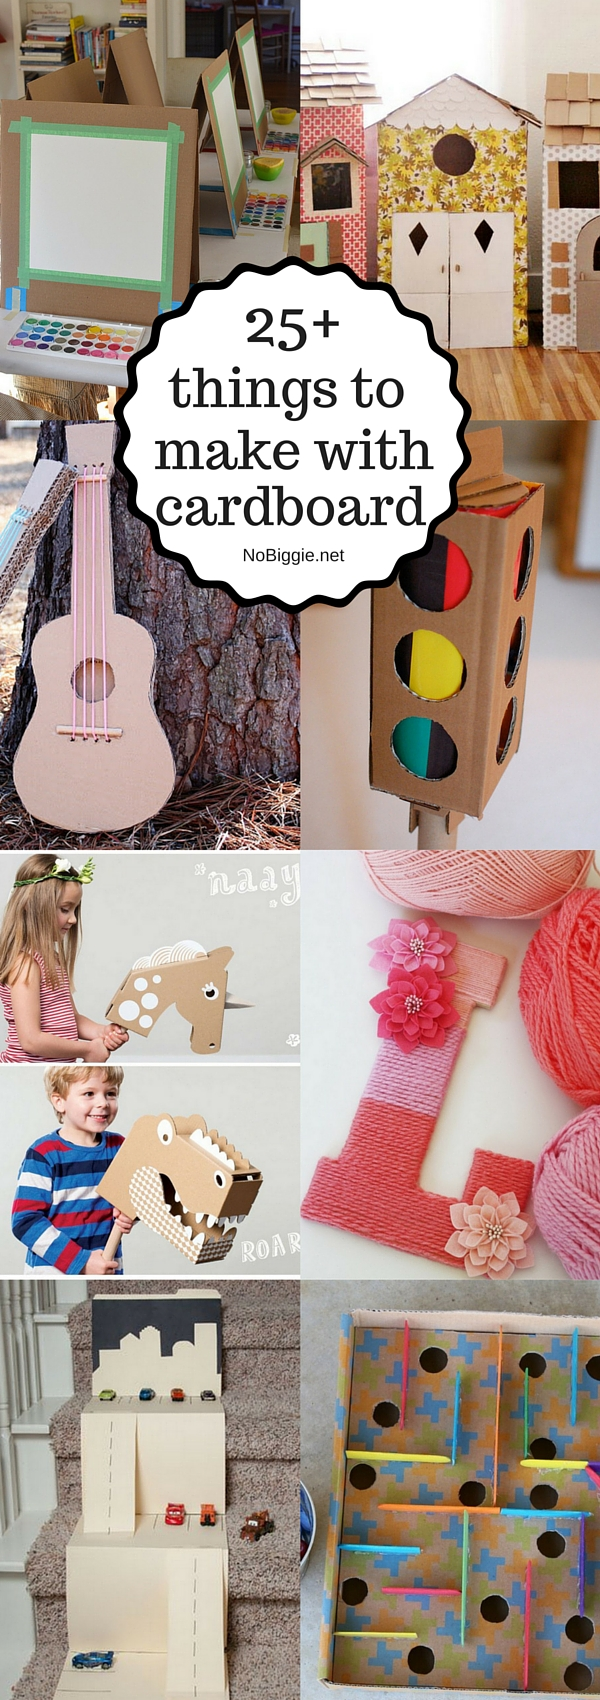 25+ things to make with cardboard | NoBiggie.net